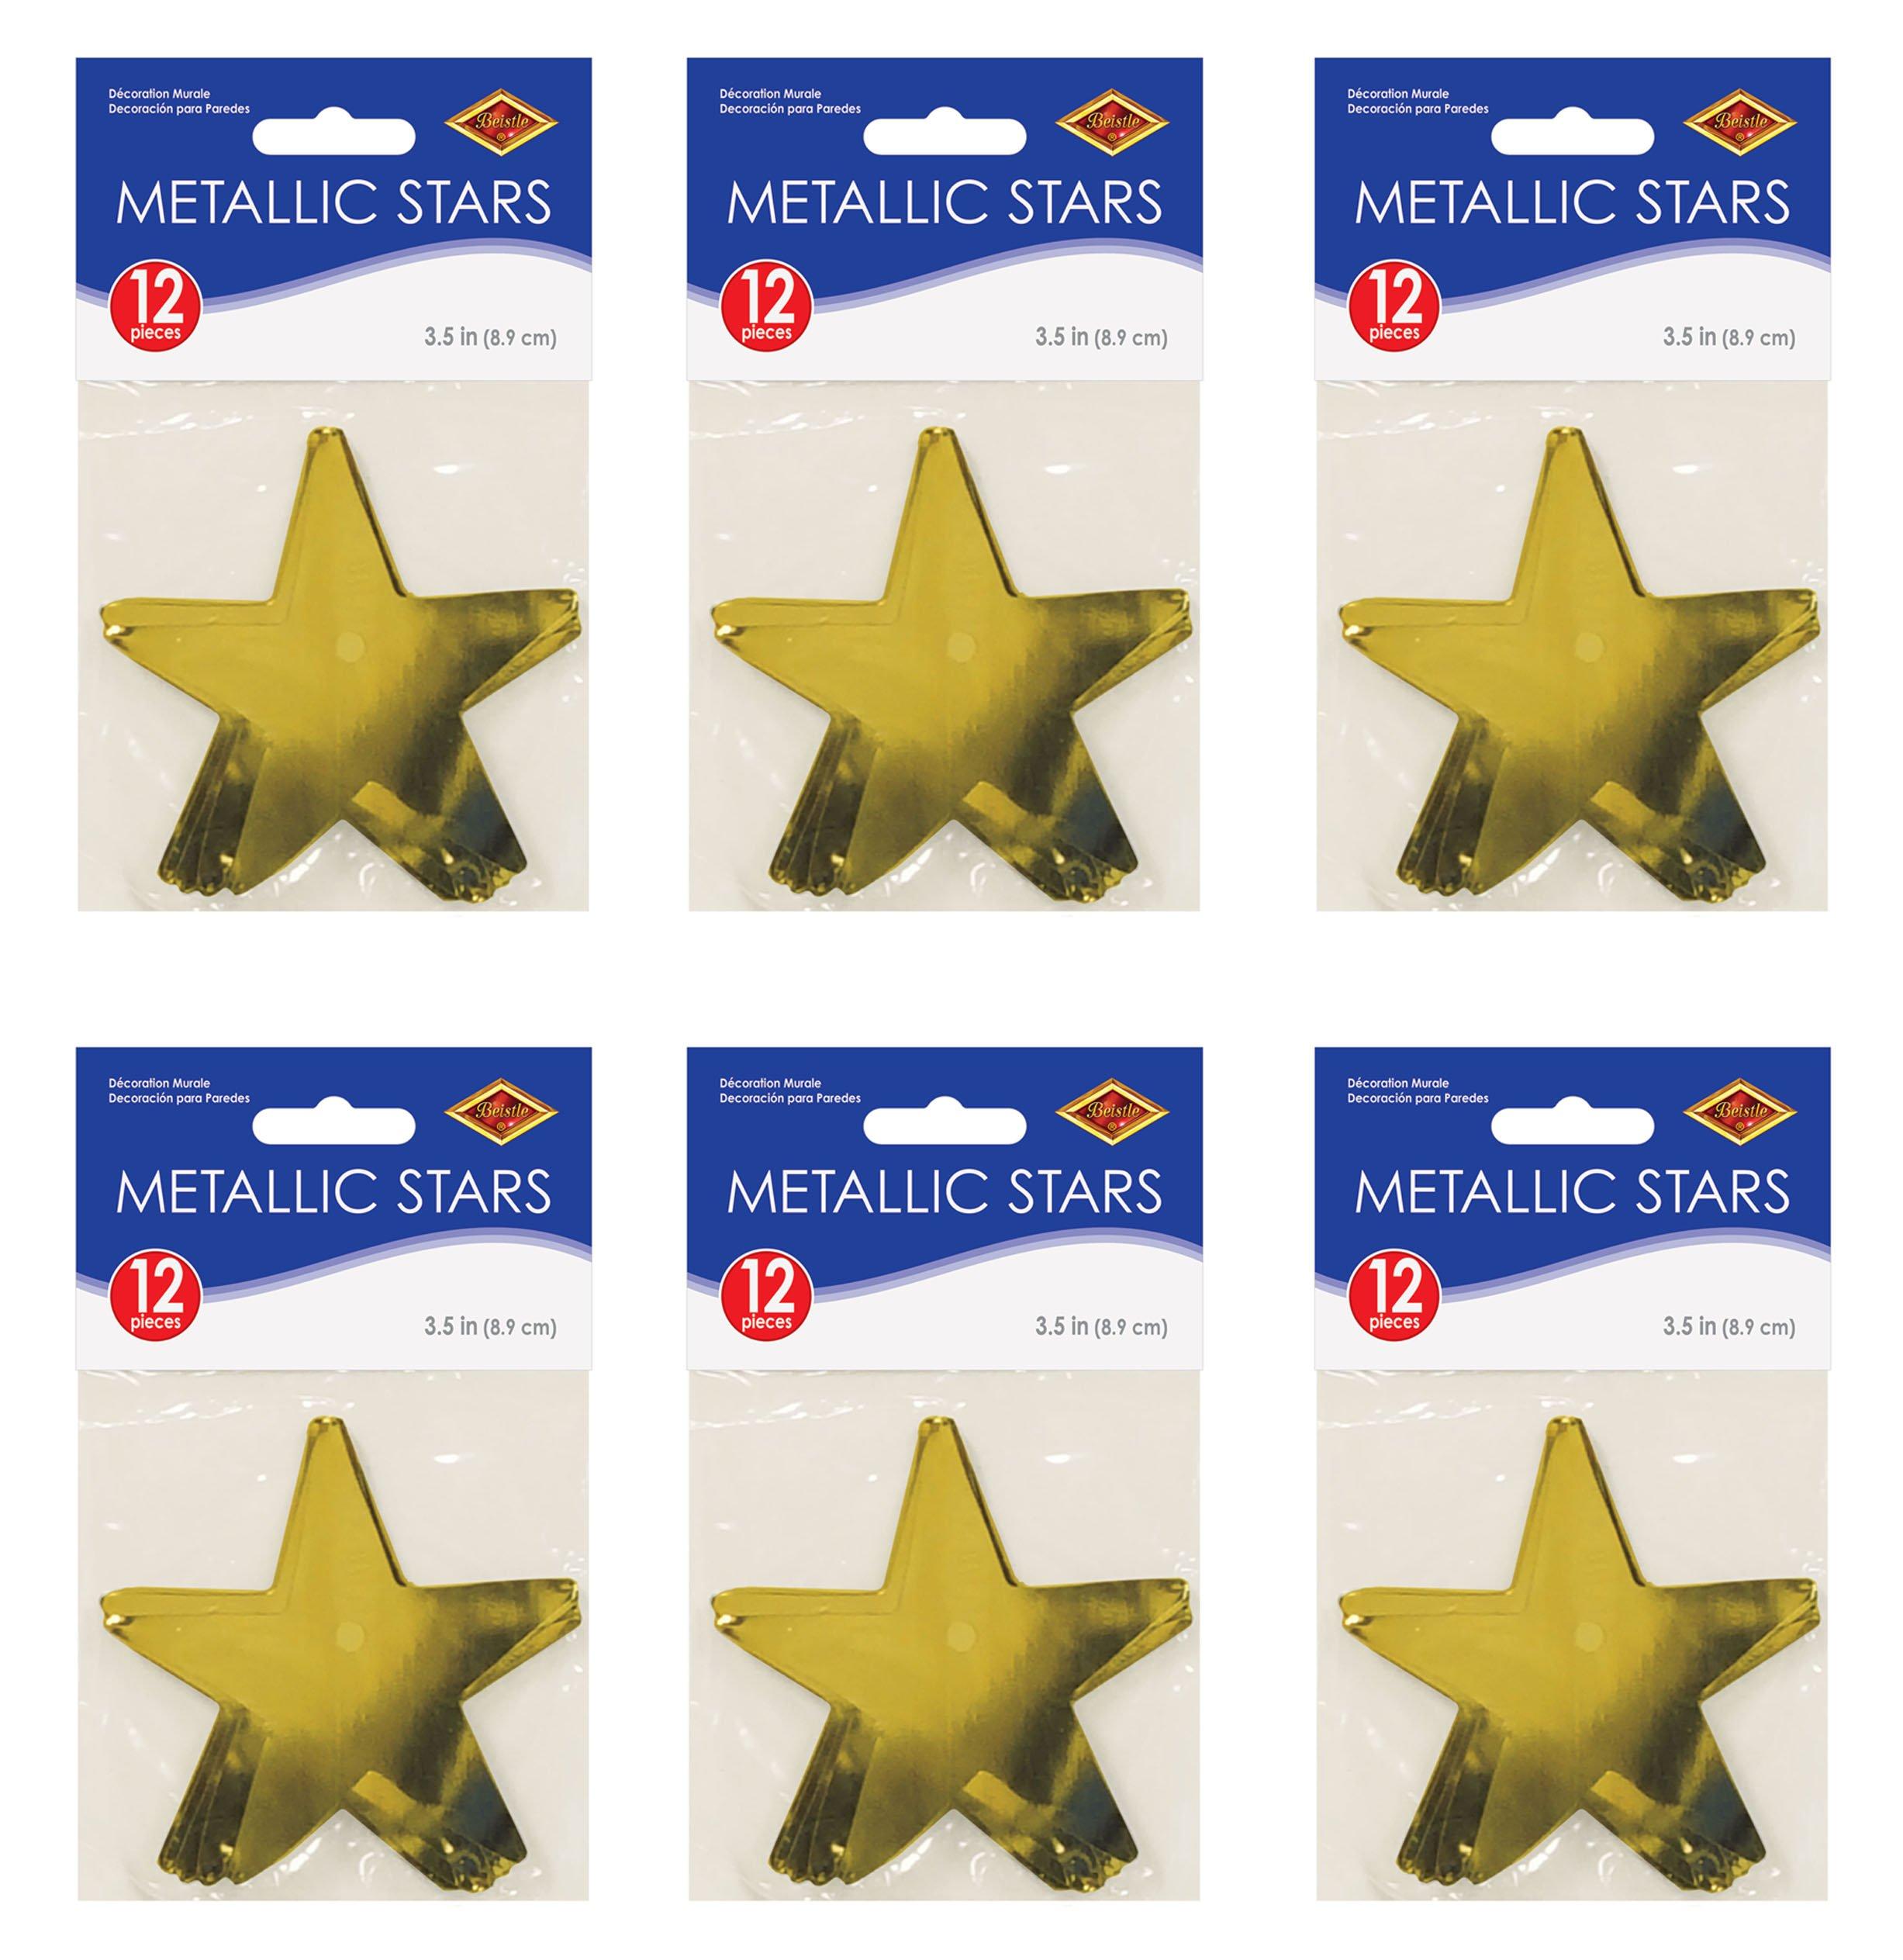 Beistle S57027-GDAZ6 Metallic Star Cutouts 72 Piece, Gold by Beistle